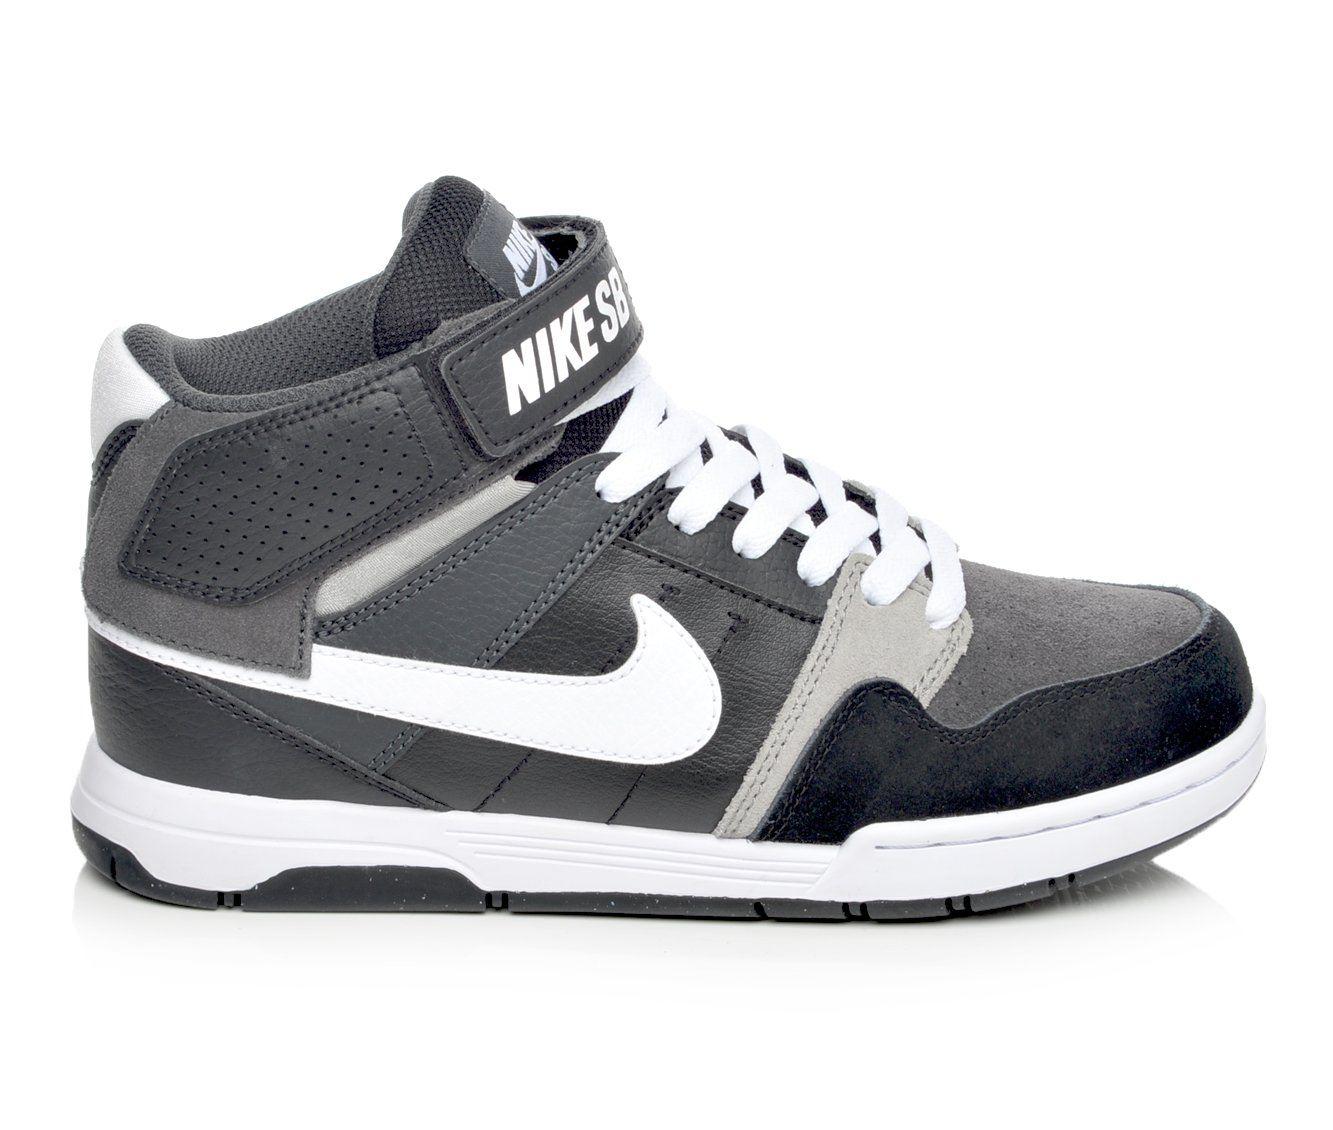 Boys' Nike Mogan Mid 2 Jr Skate Shoes (Black)